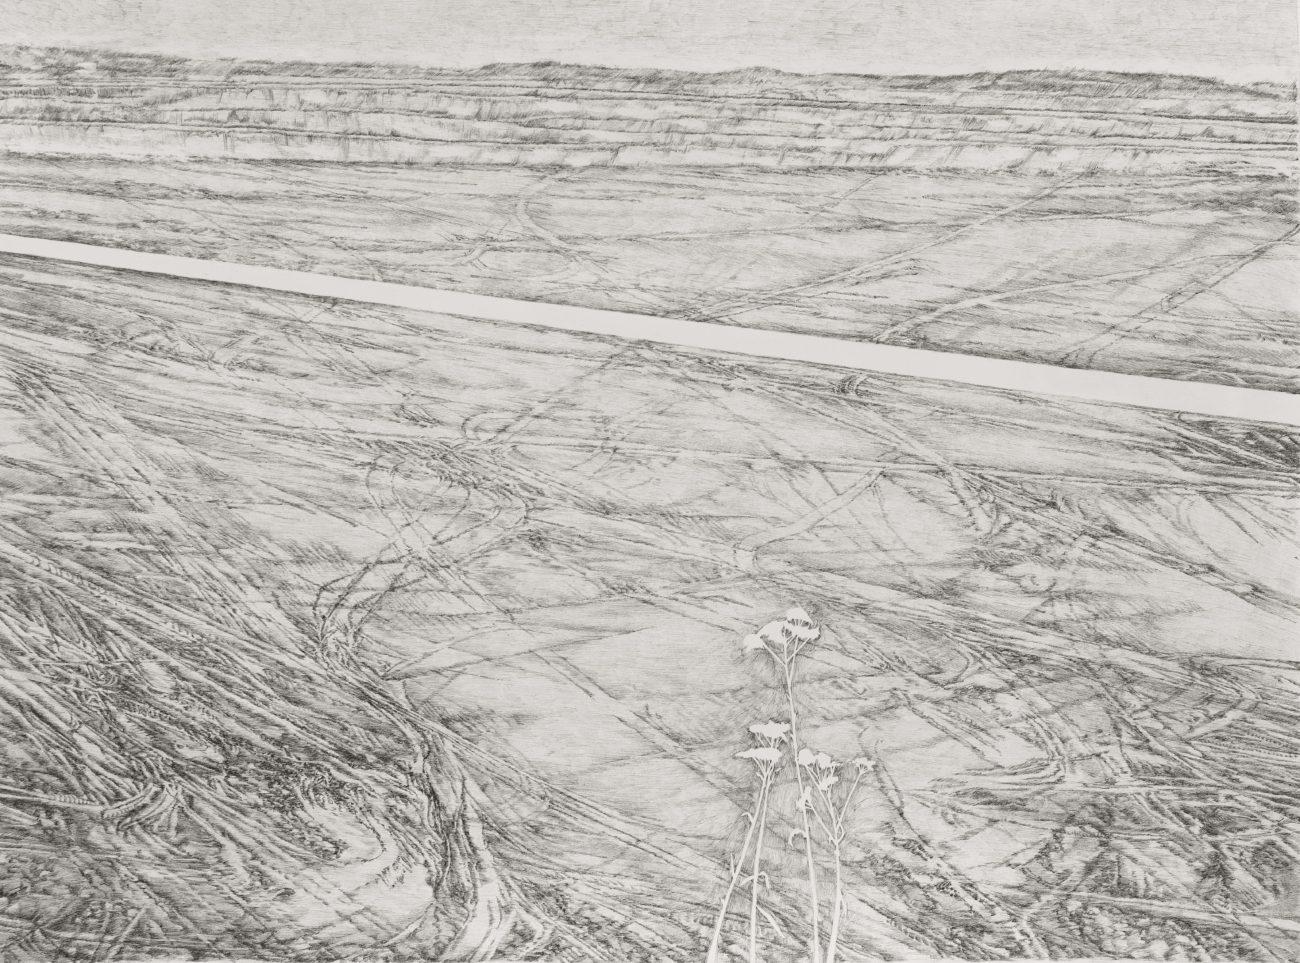 Emmanuel Henninger, openpit, hambach, allemagne, dessin, encre, noir, blanc, industrie, contemporain, art